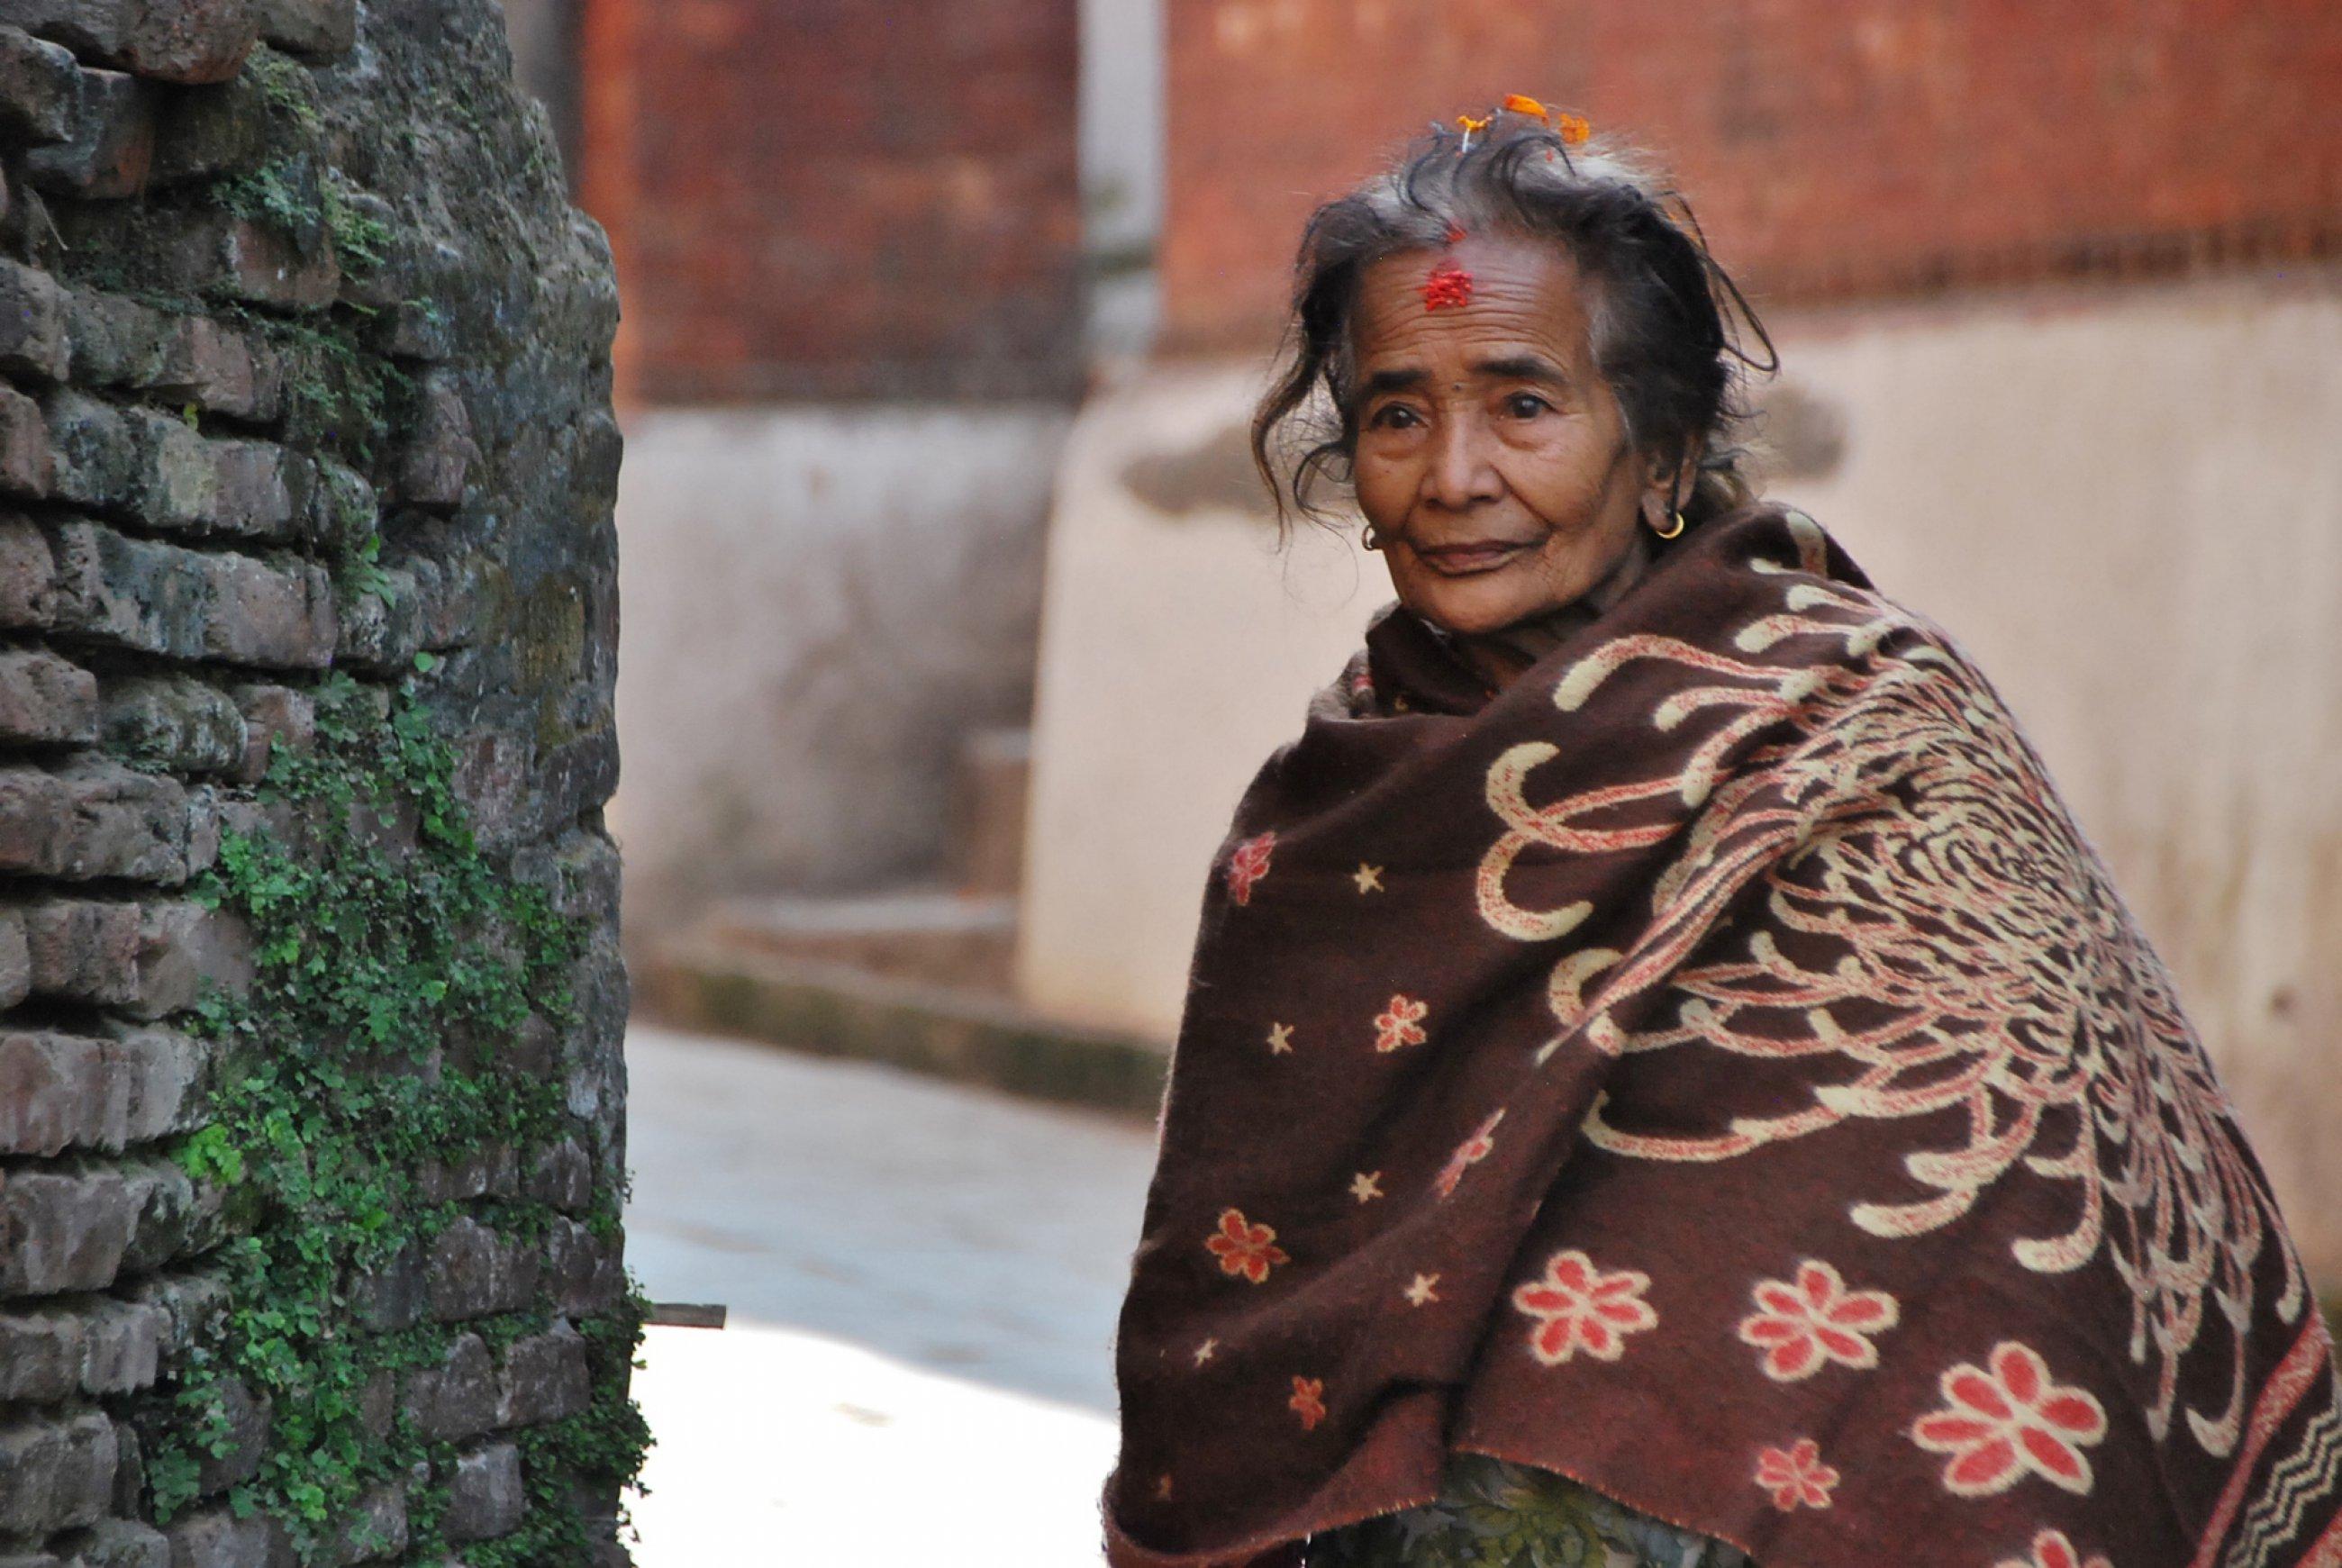 https://bubo.sk/uploads/galleries/16319/nepal-kathmandu-ctni-11-2014-mirka-sulka-425-.jpg